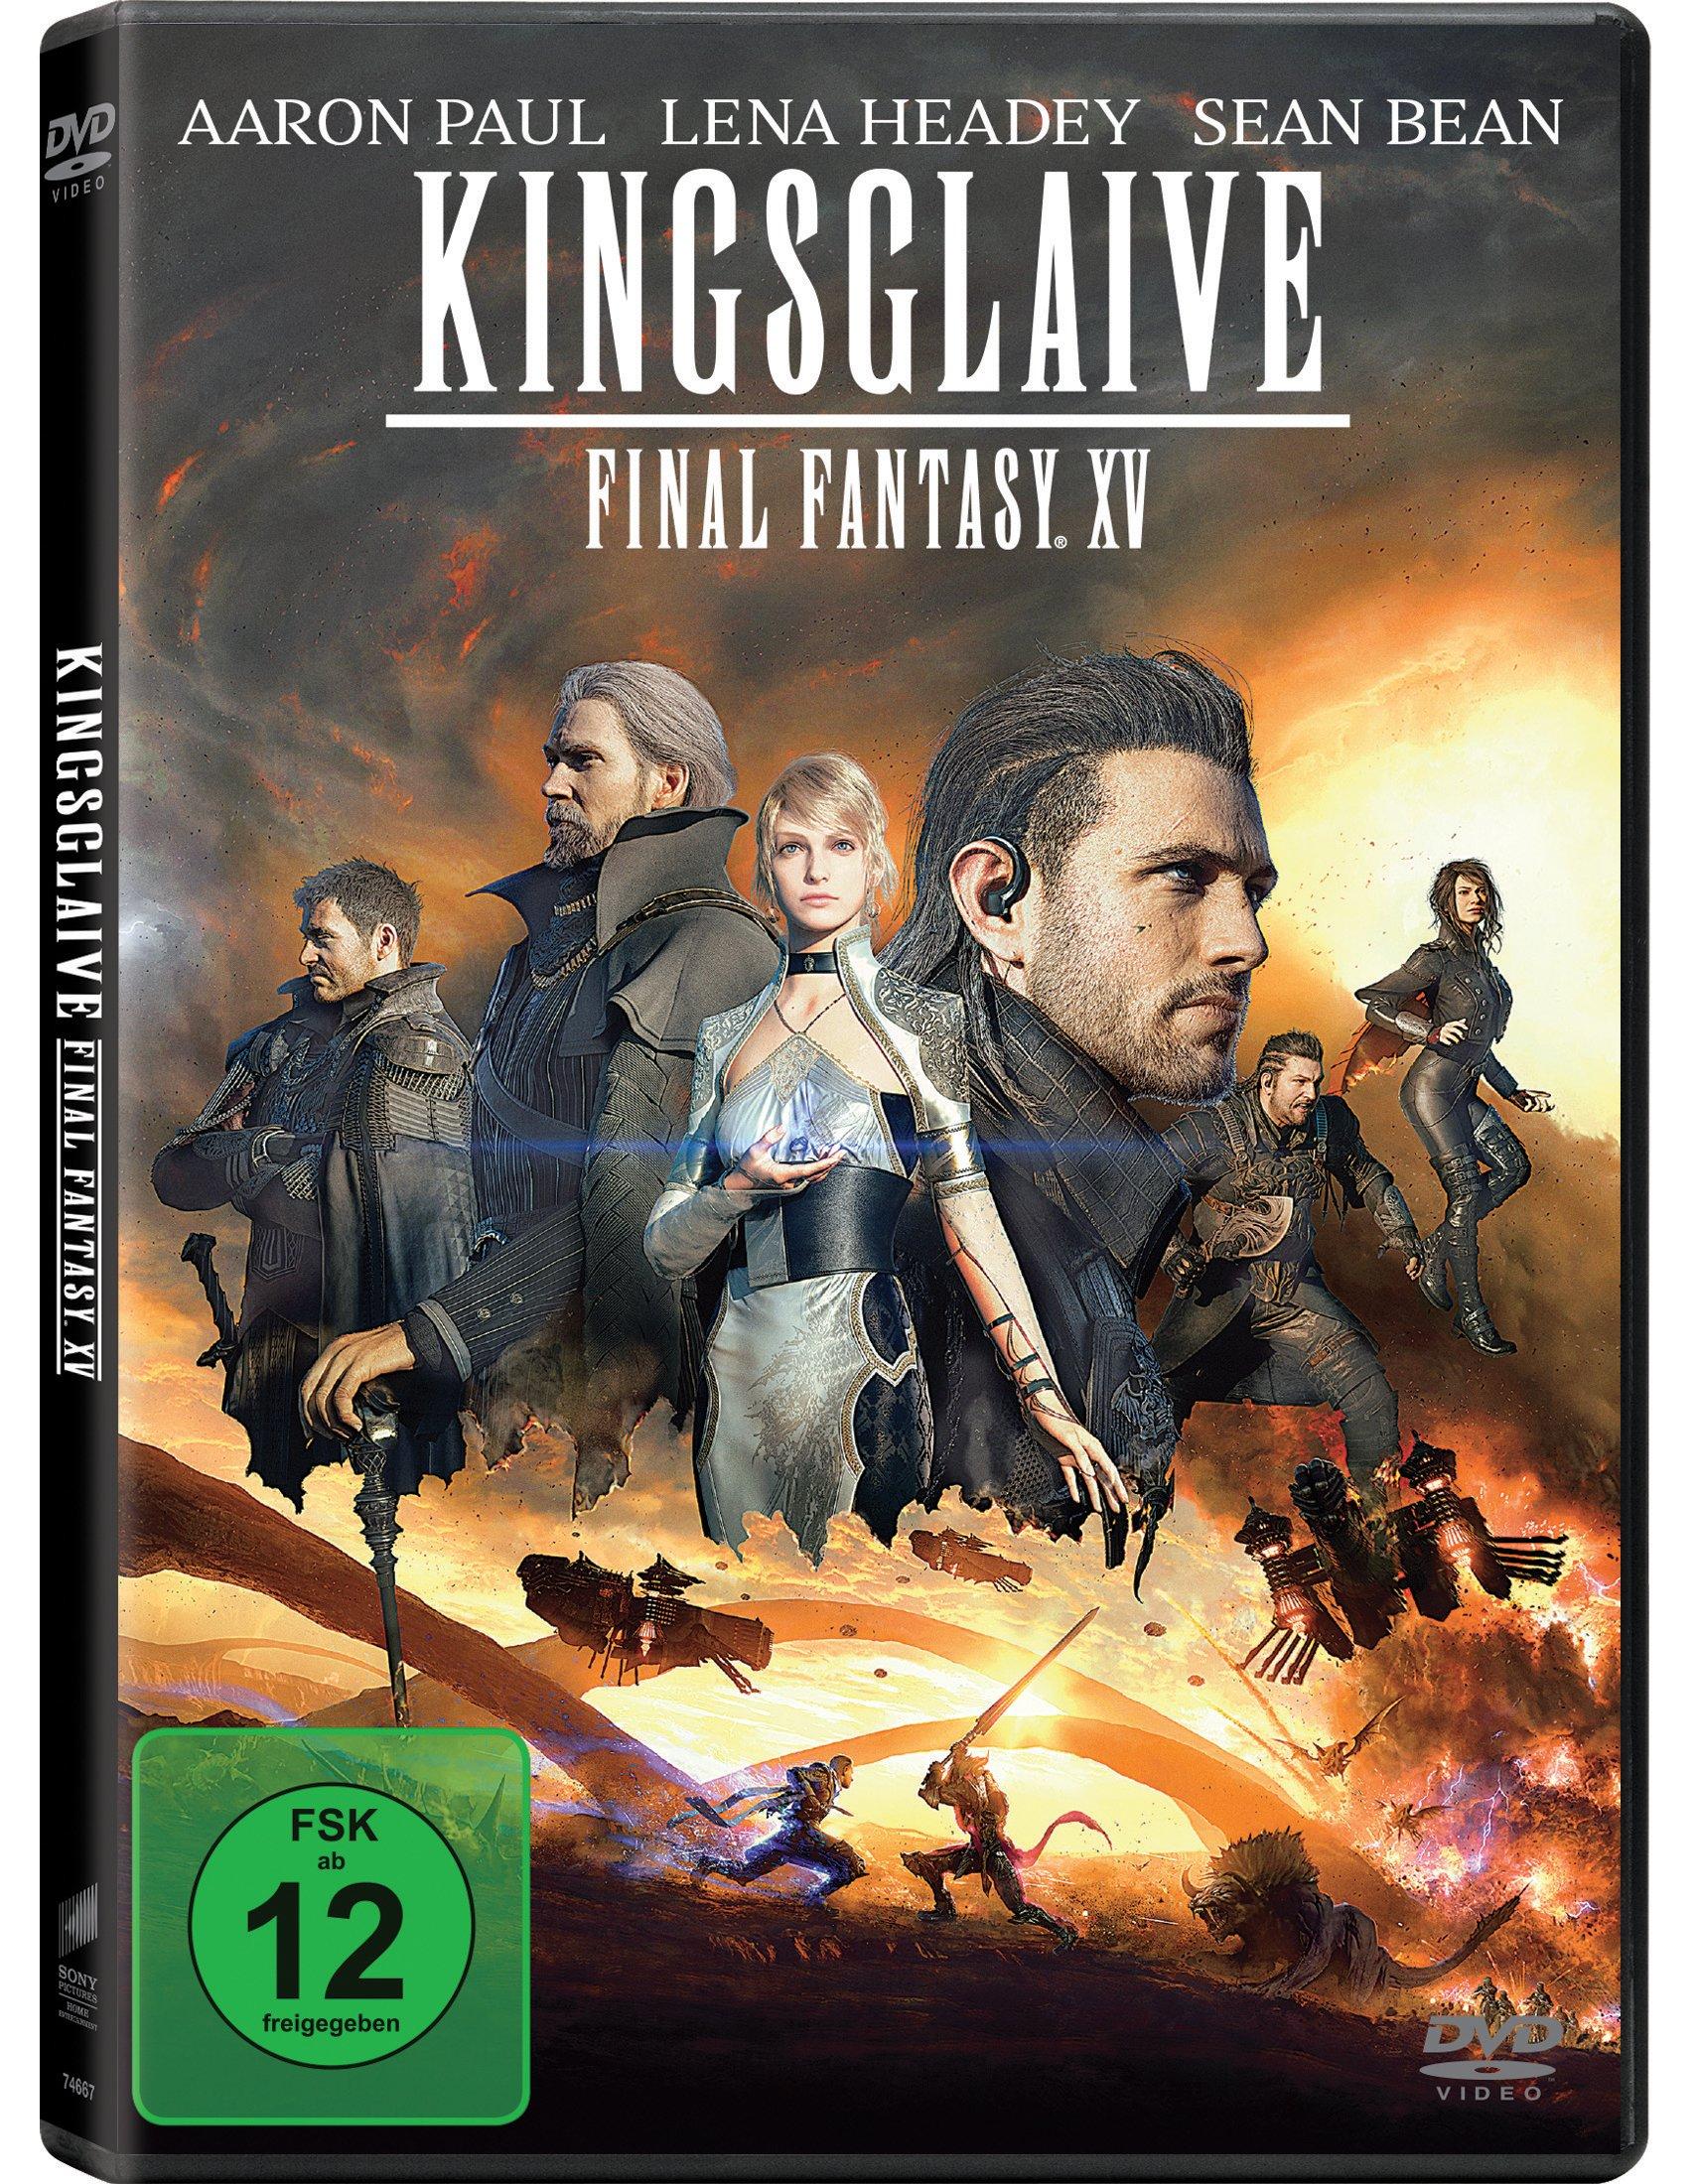 : Kingsglaive Final Fantasy Xv 2016 German 720p BluRay x264-Encounters